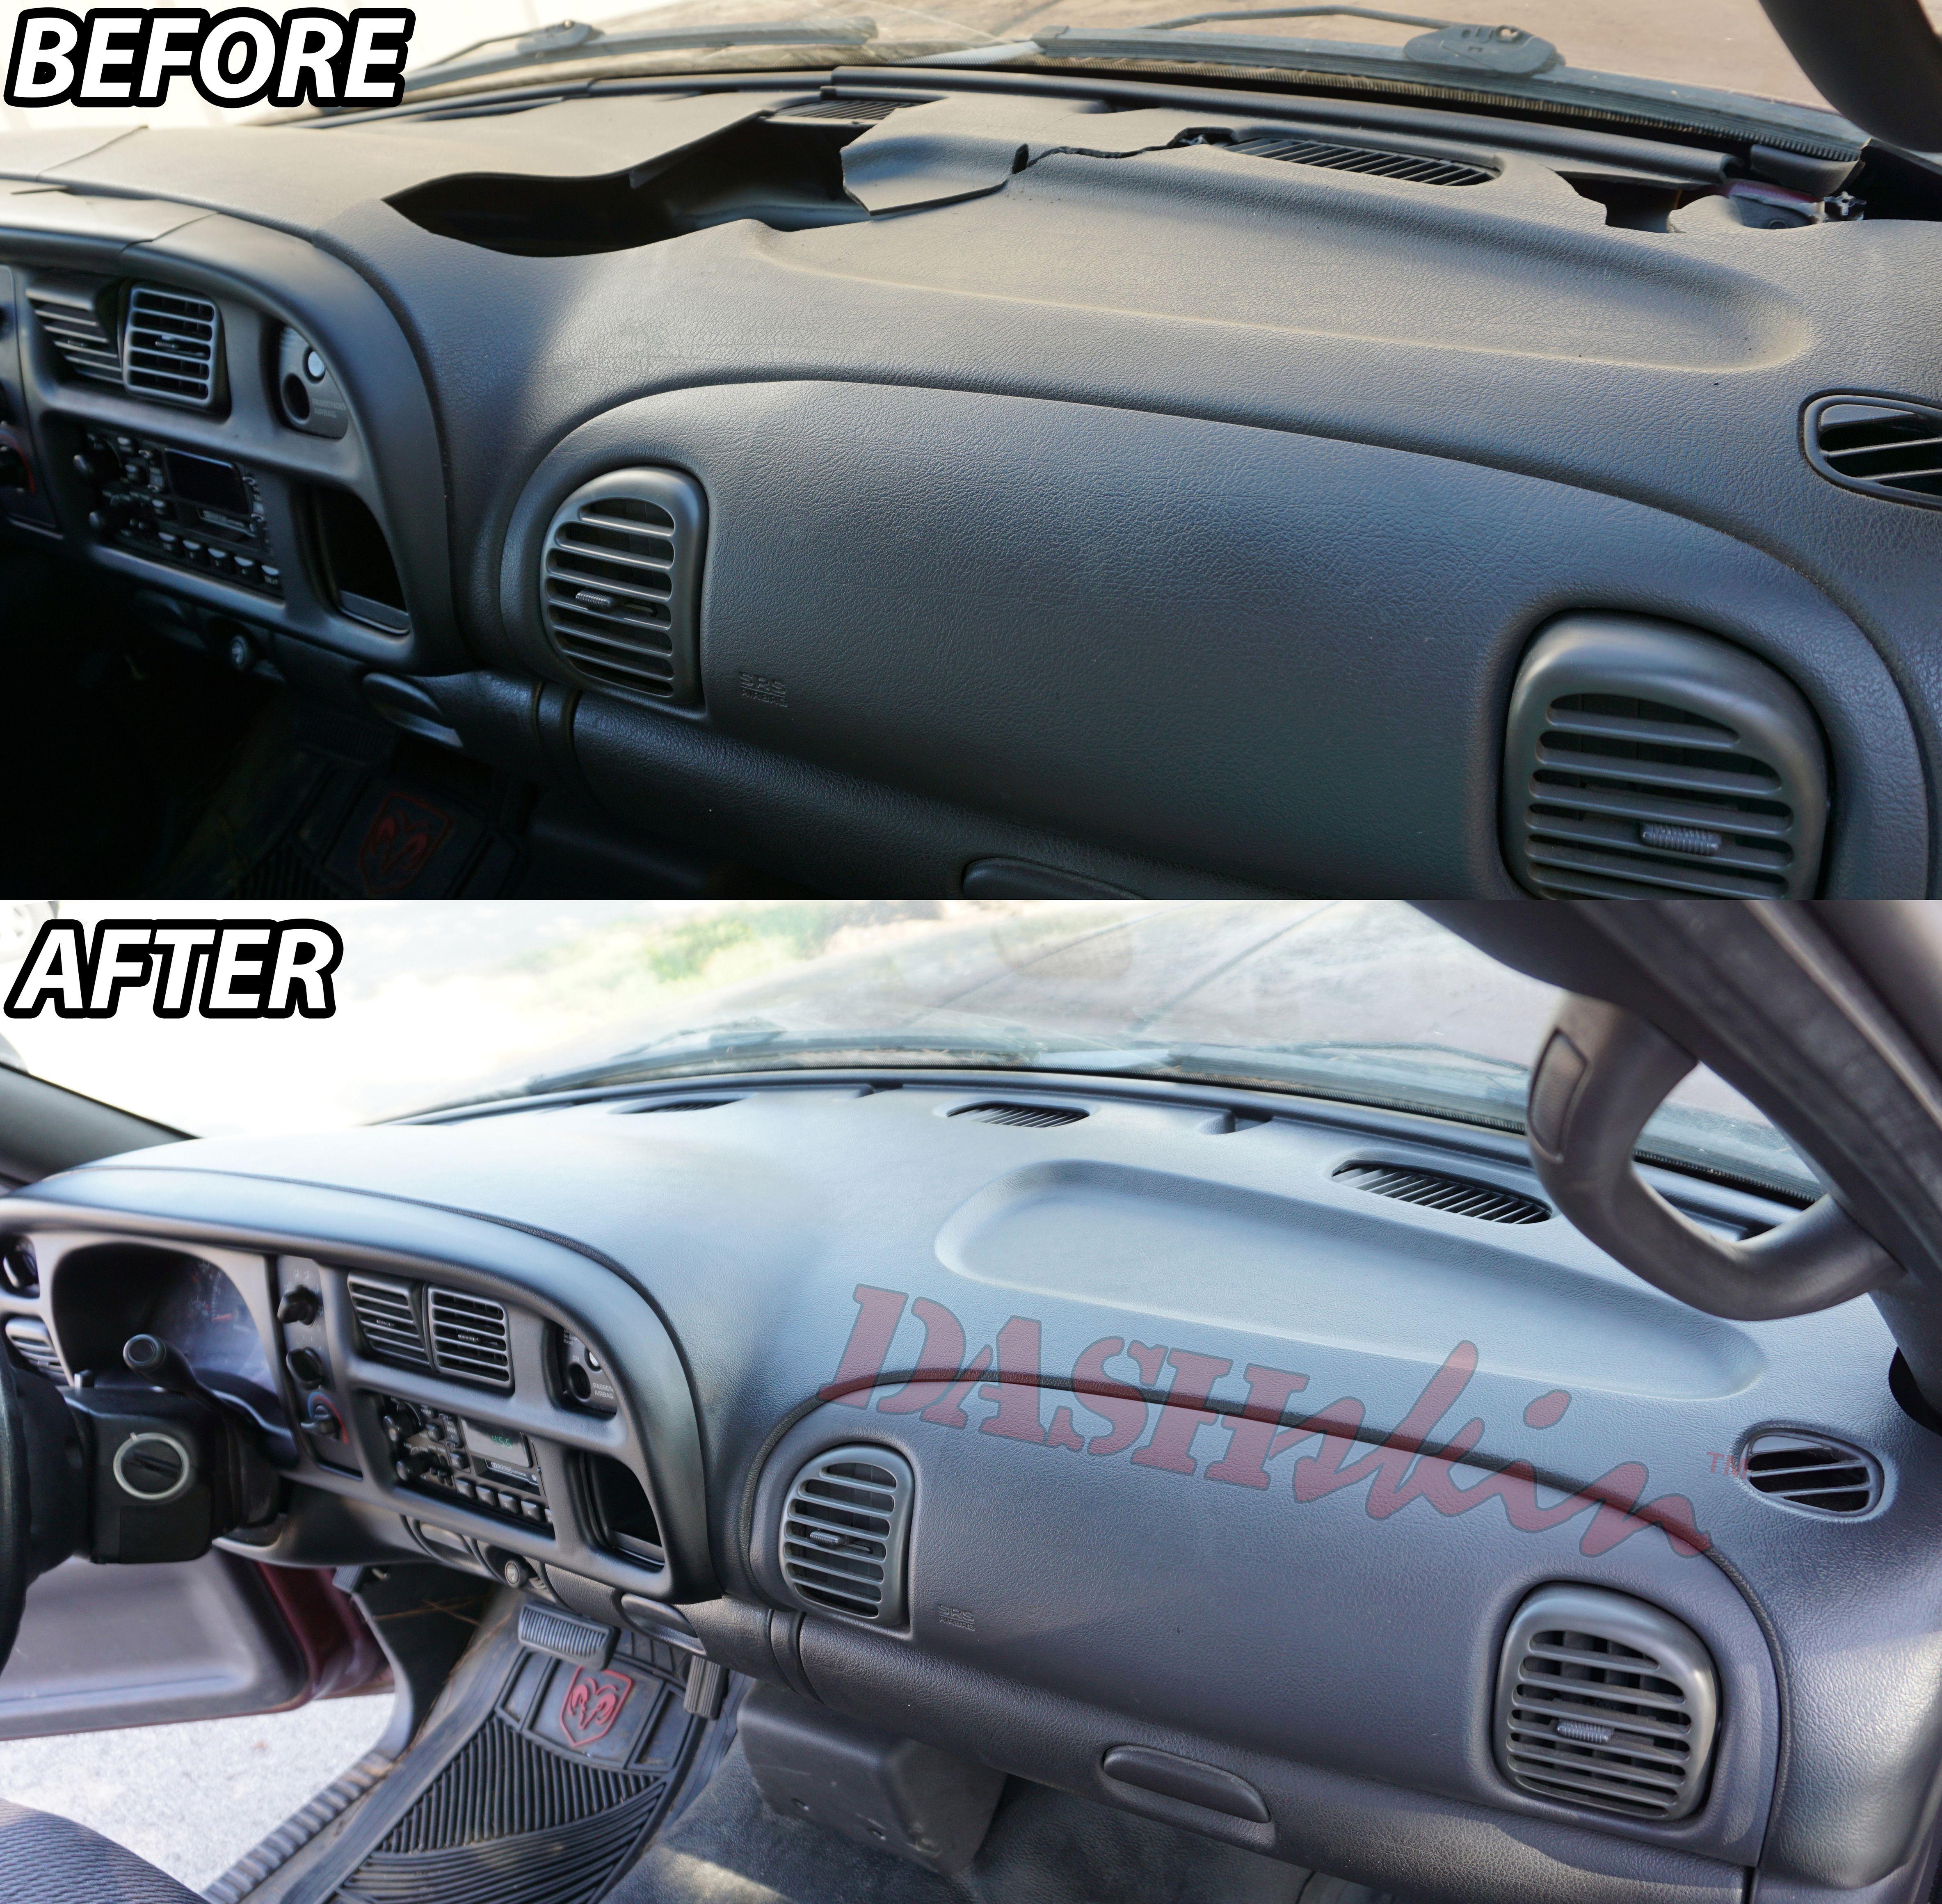 Dashskin Cover Before After 2001 Dodge Ram 1500 Dodge Ram 1500 Dodge Ram